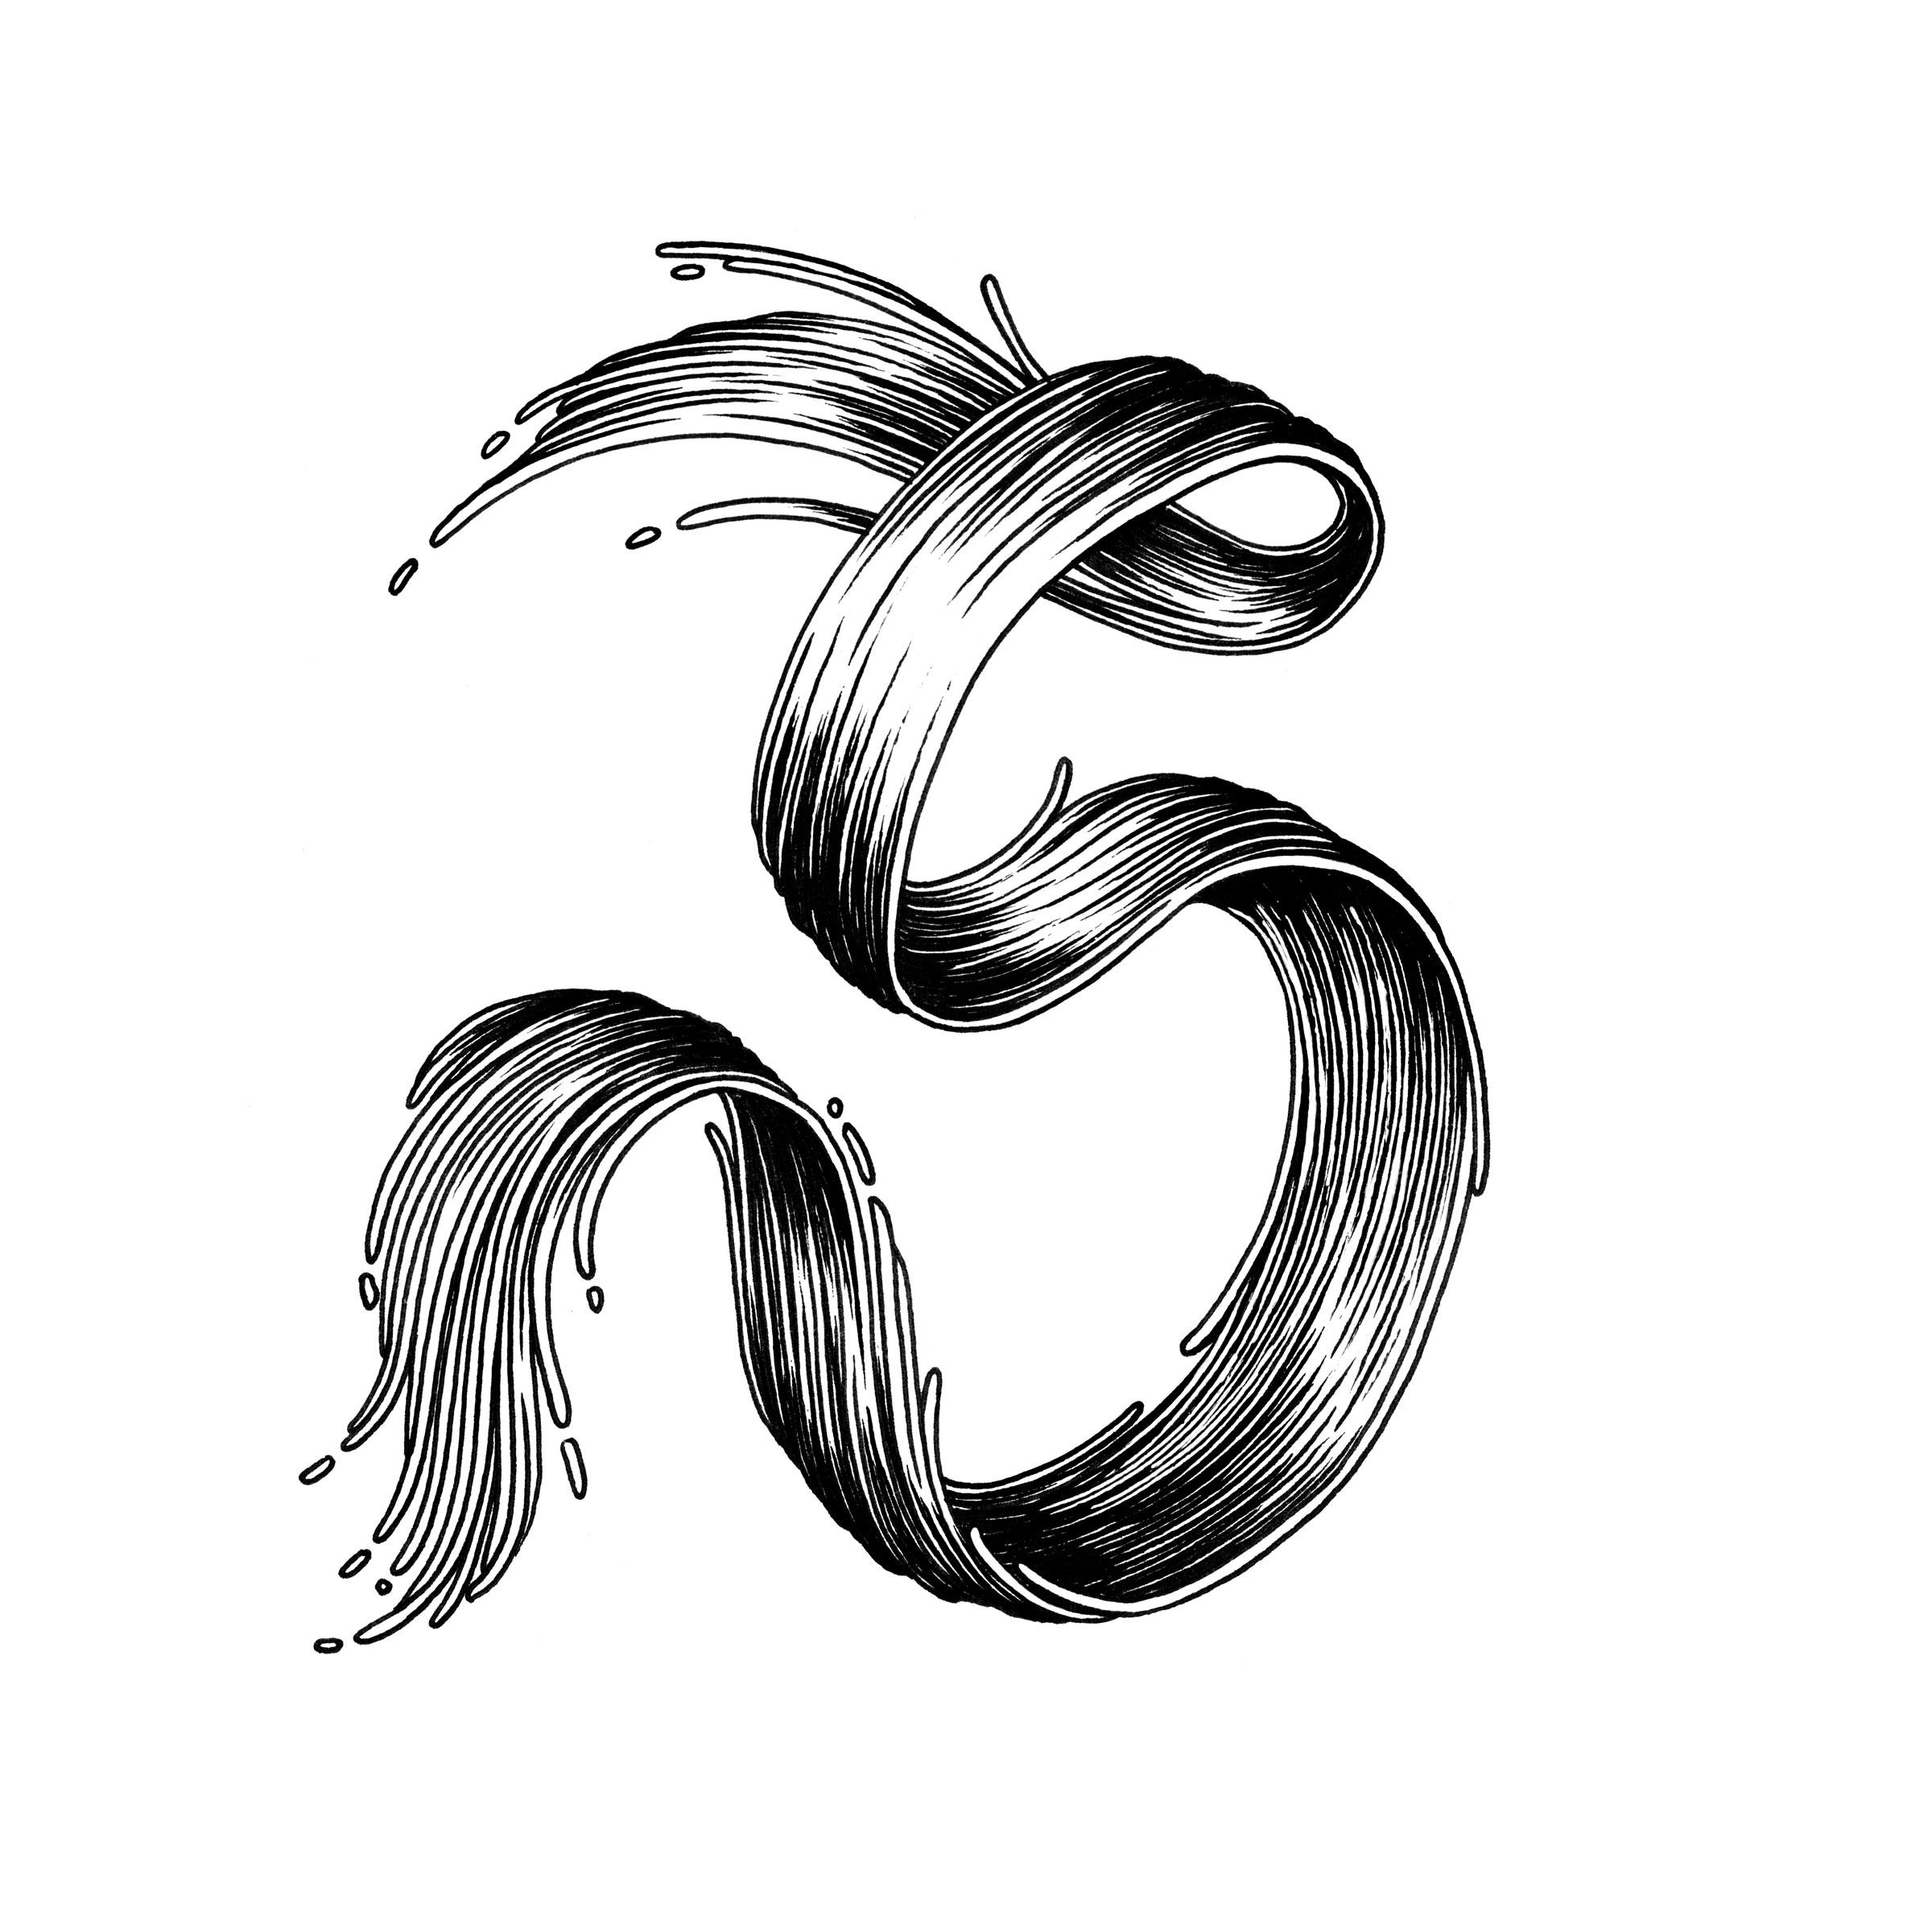 S_02-web.jpg